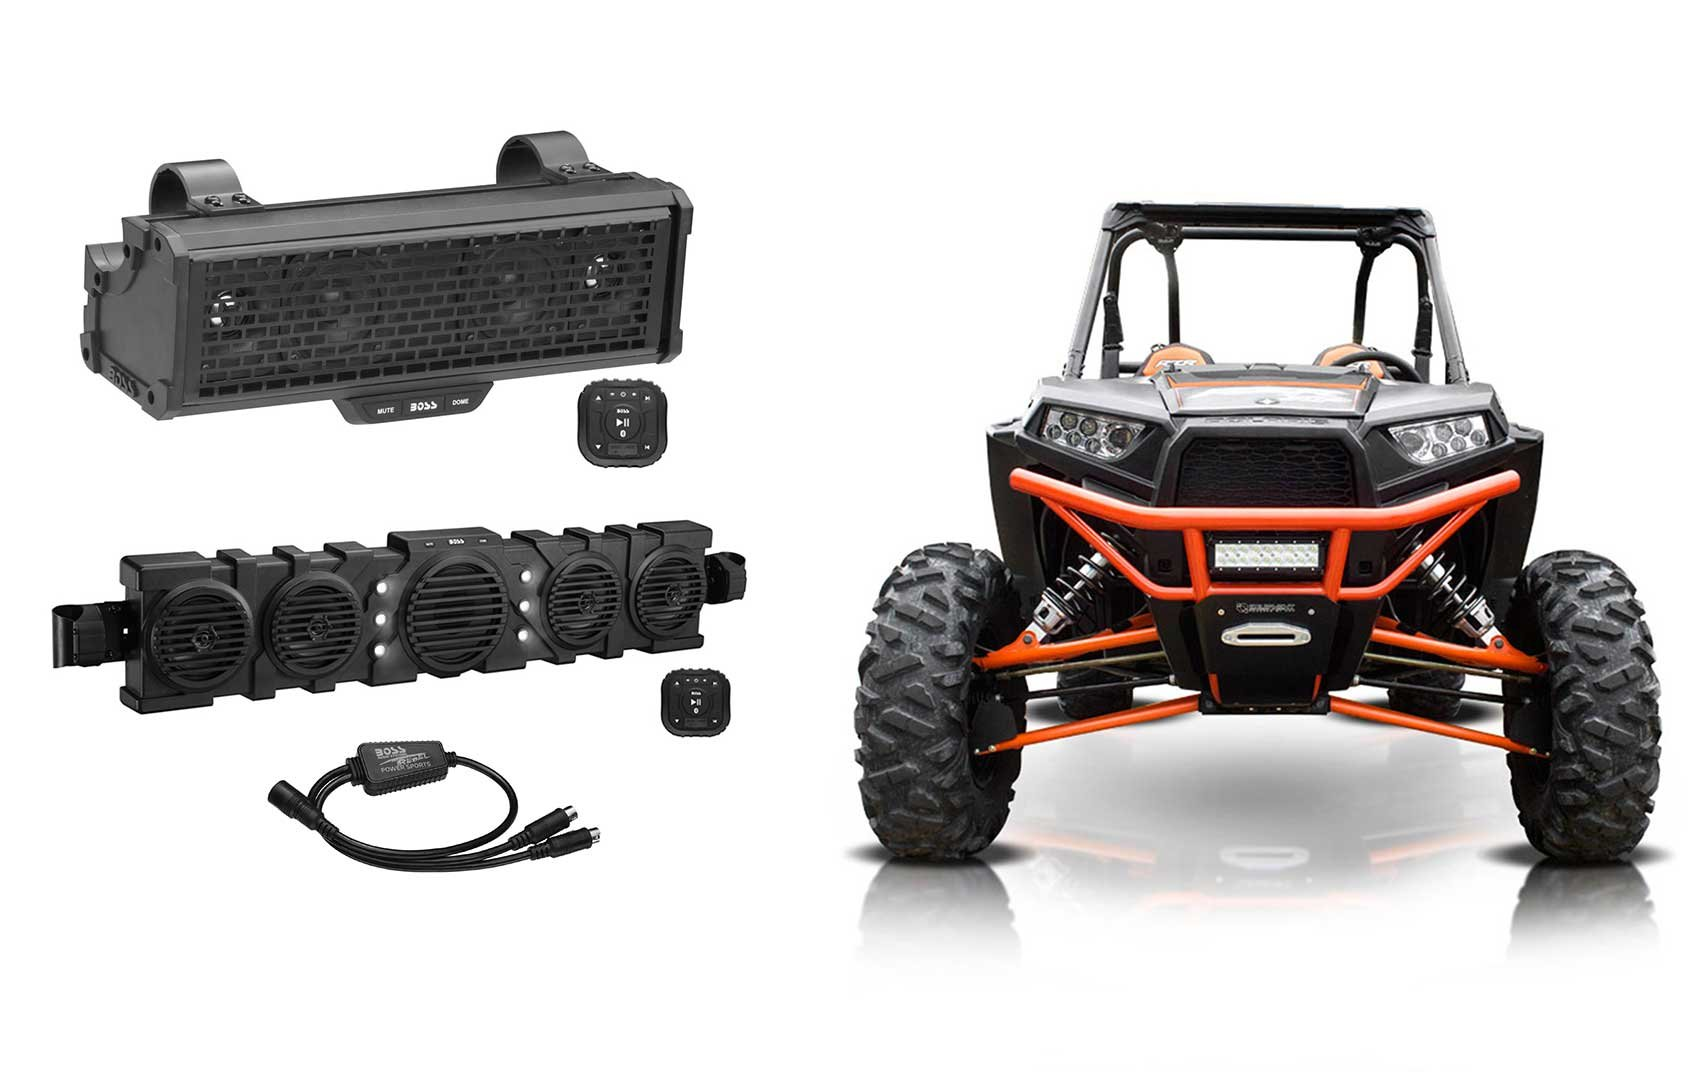 Boss BRRC14+BRRF46 Powered Sound Bars+Bluetooth Controllers+Lights RZR/ATV/UTV